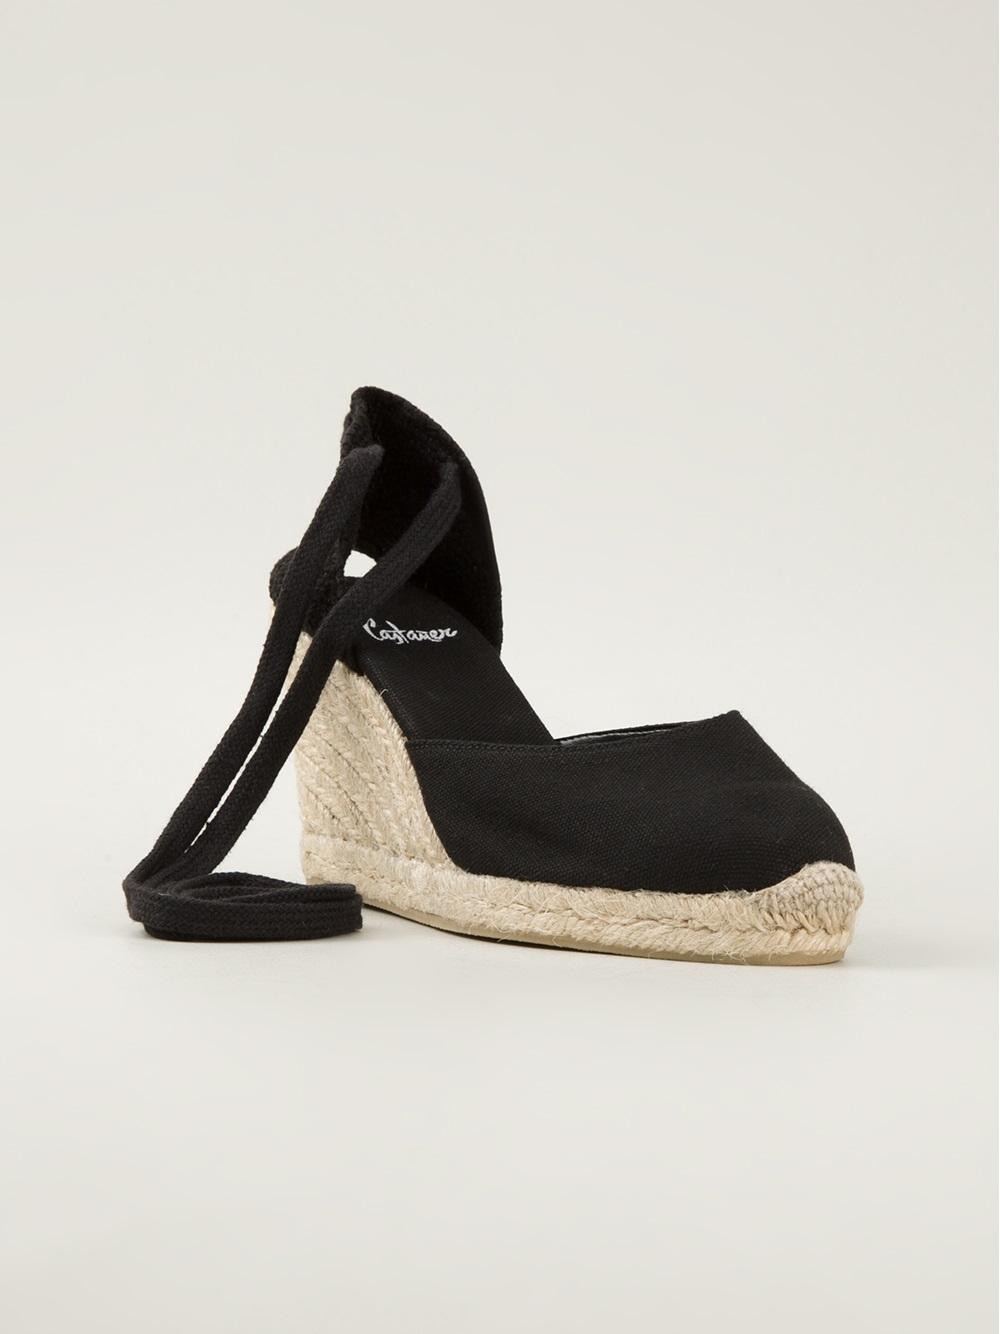 Castaner Carina Espadrille Sandals In Black Lyst